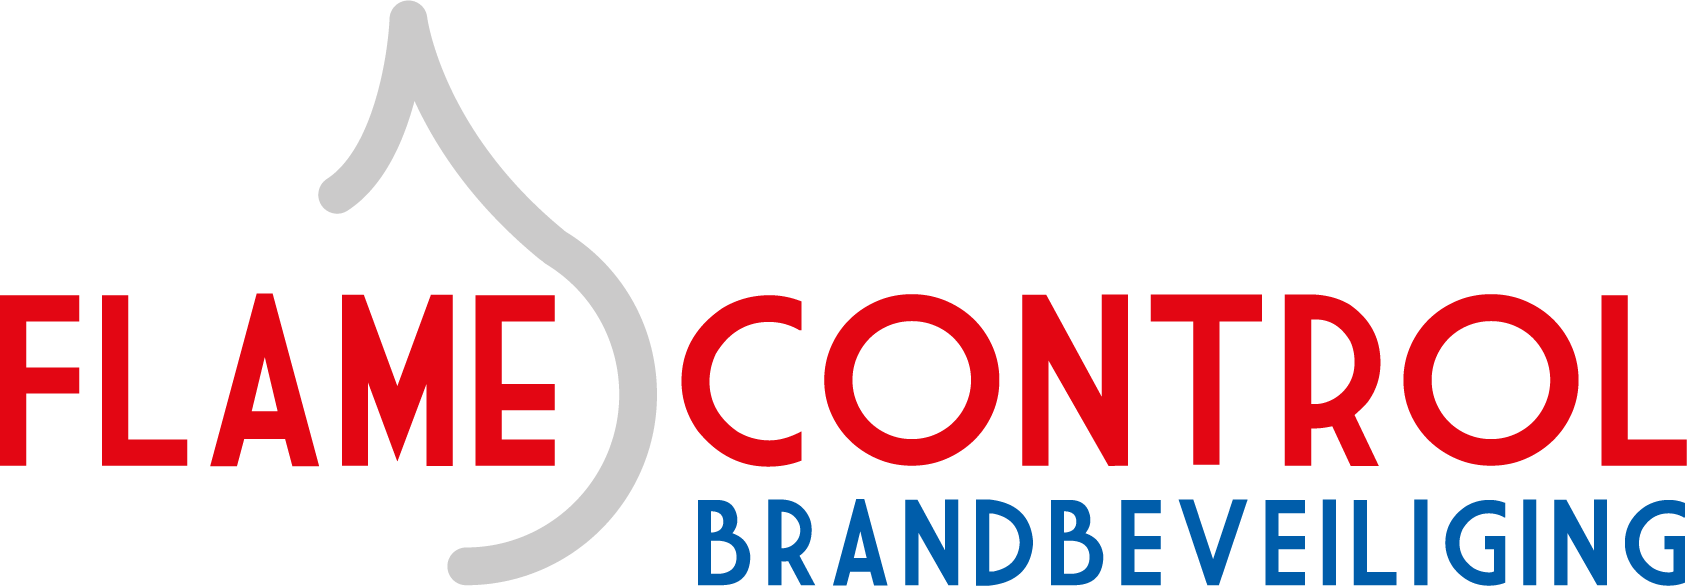 Logo Flame control